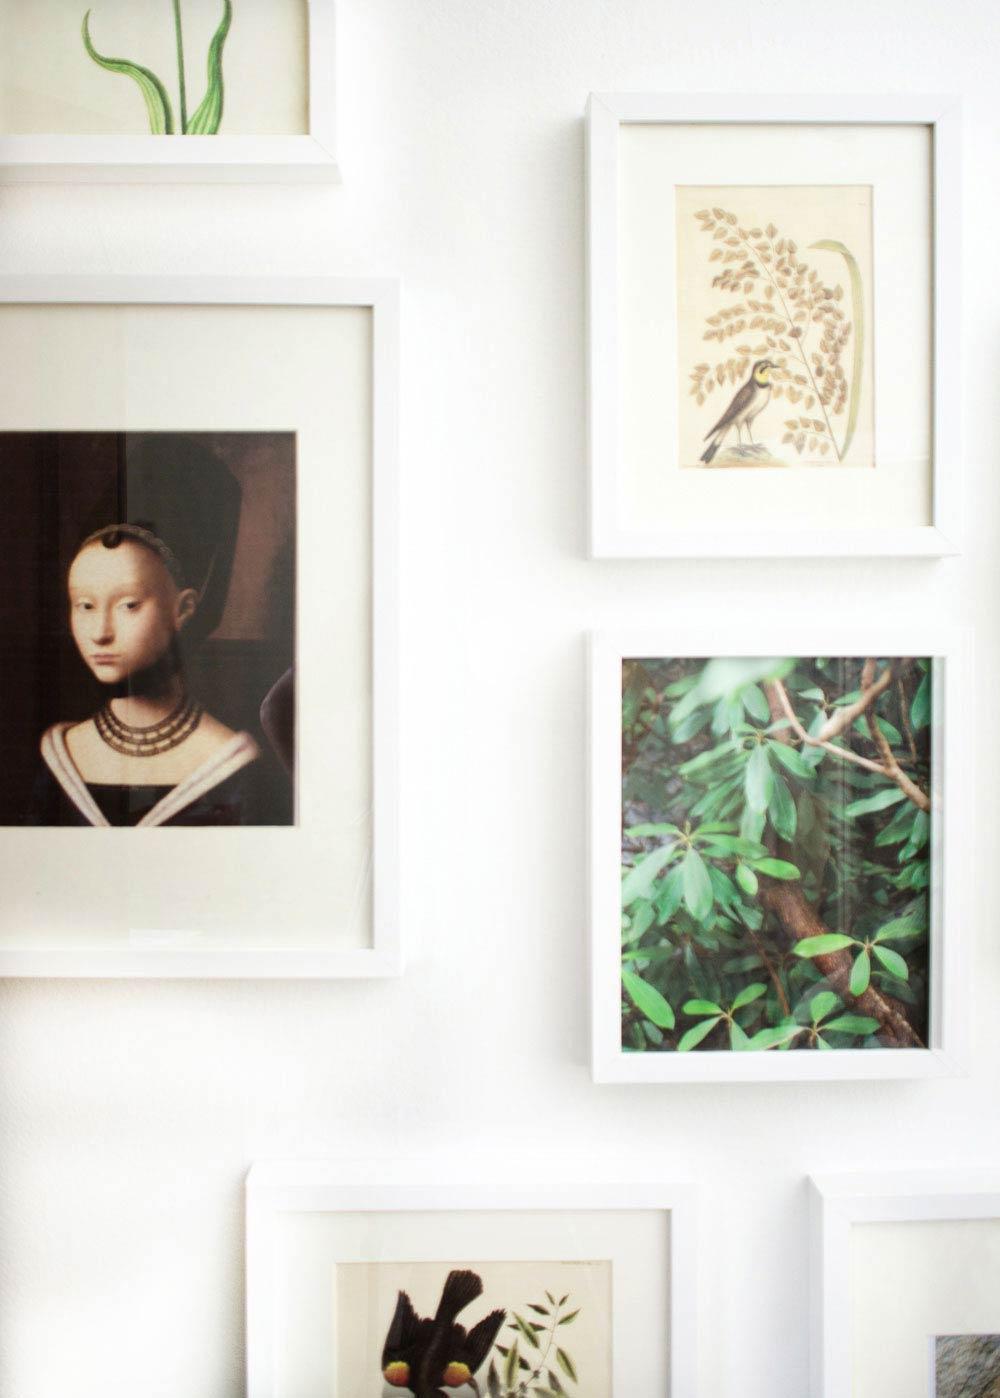 Vintage printables and photography gallery wall idea via @thouswellblog